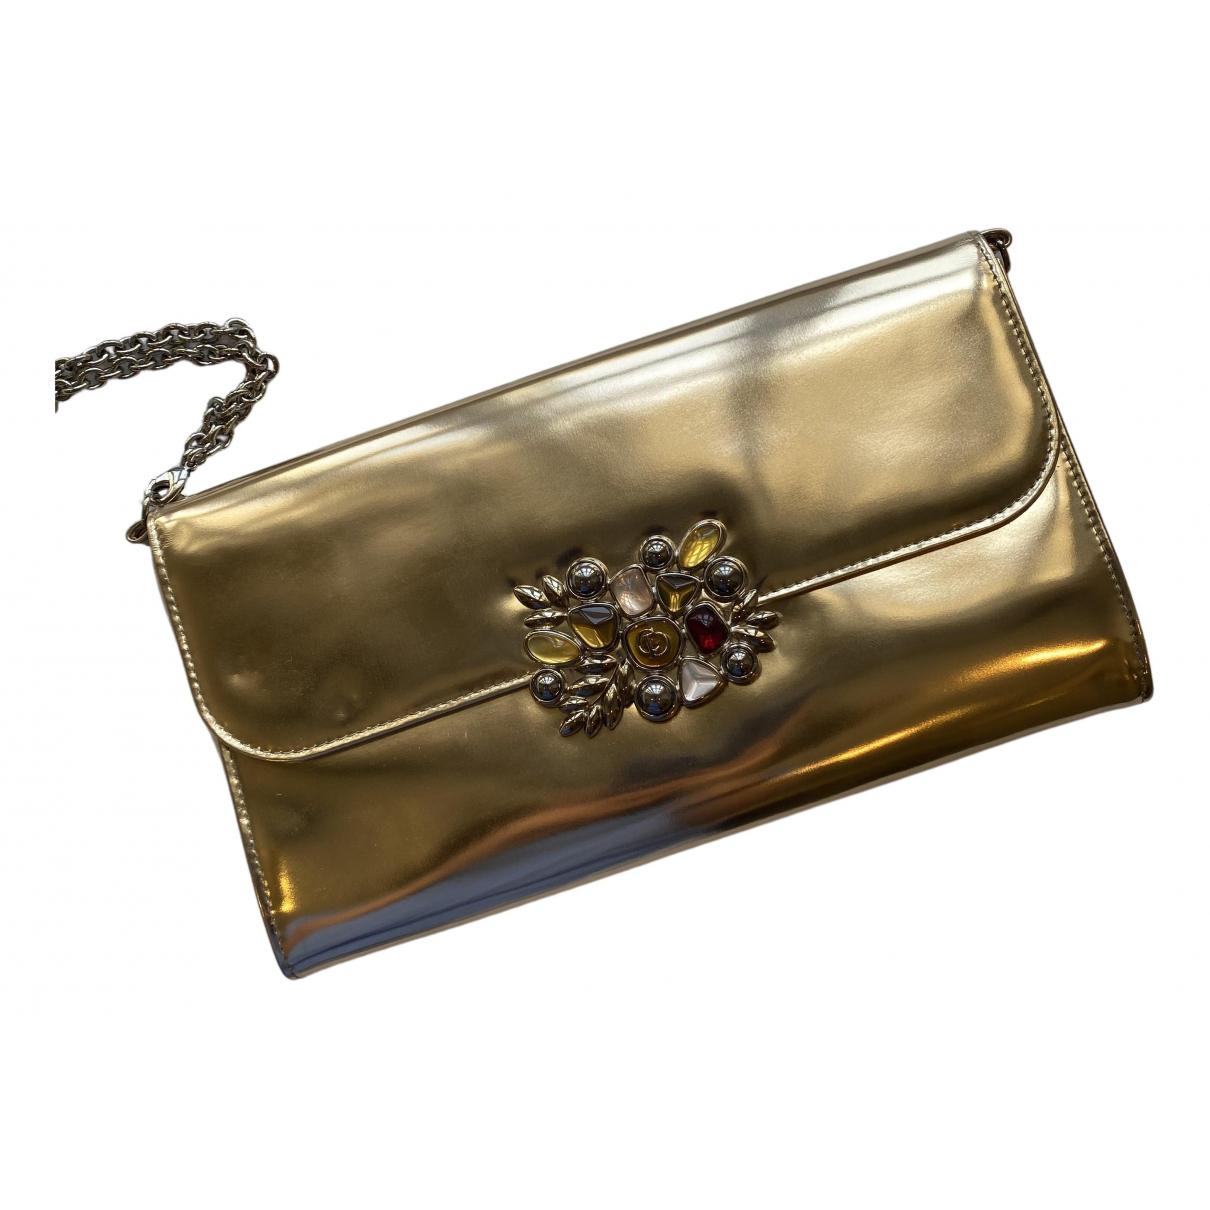 Dior \N Gold Leather Clutch bag for Women \N